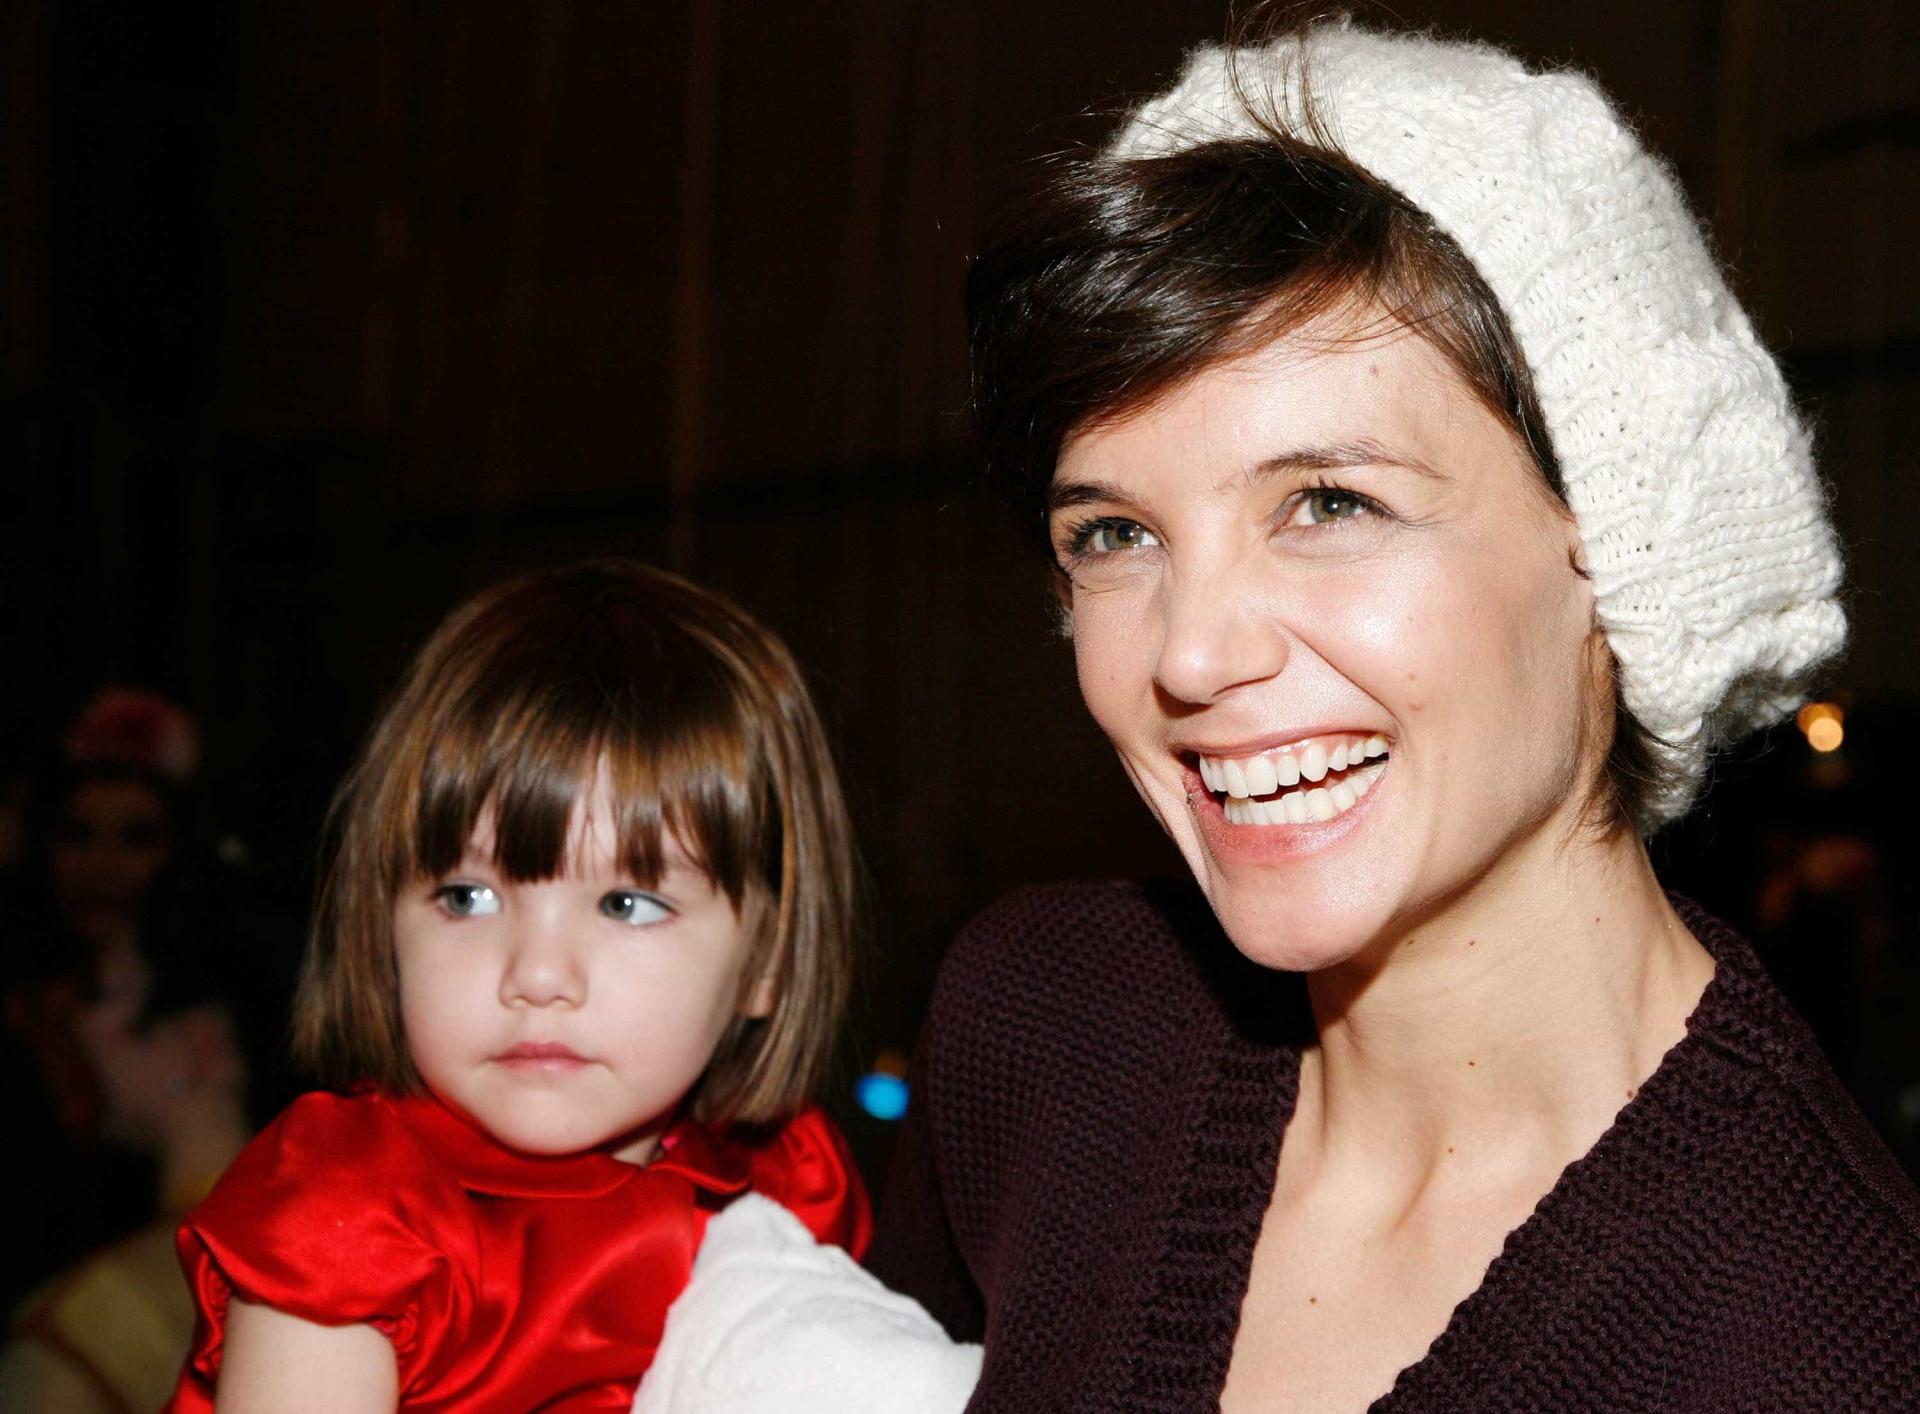 Fãs de Katie Holmes de 'boca aberta' após atriz partilhar foto da filha